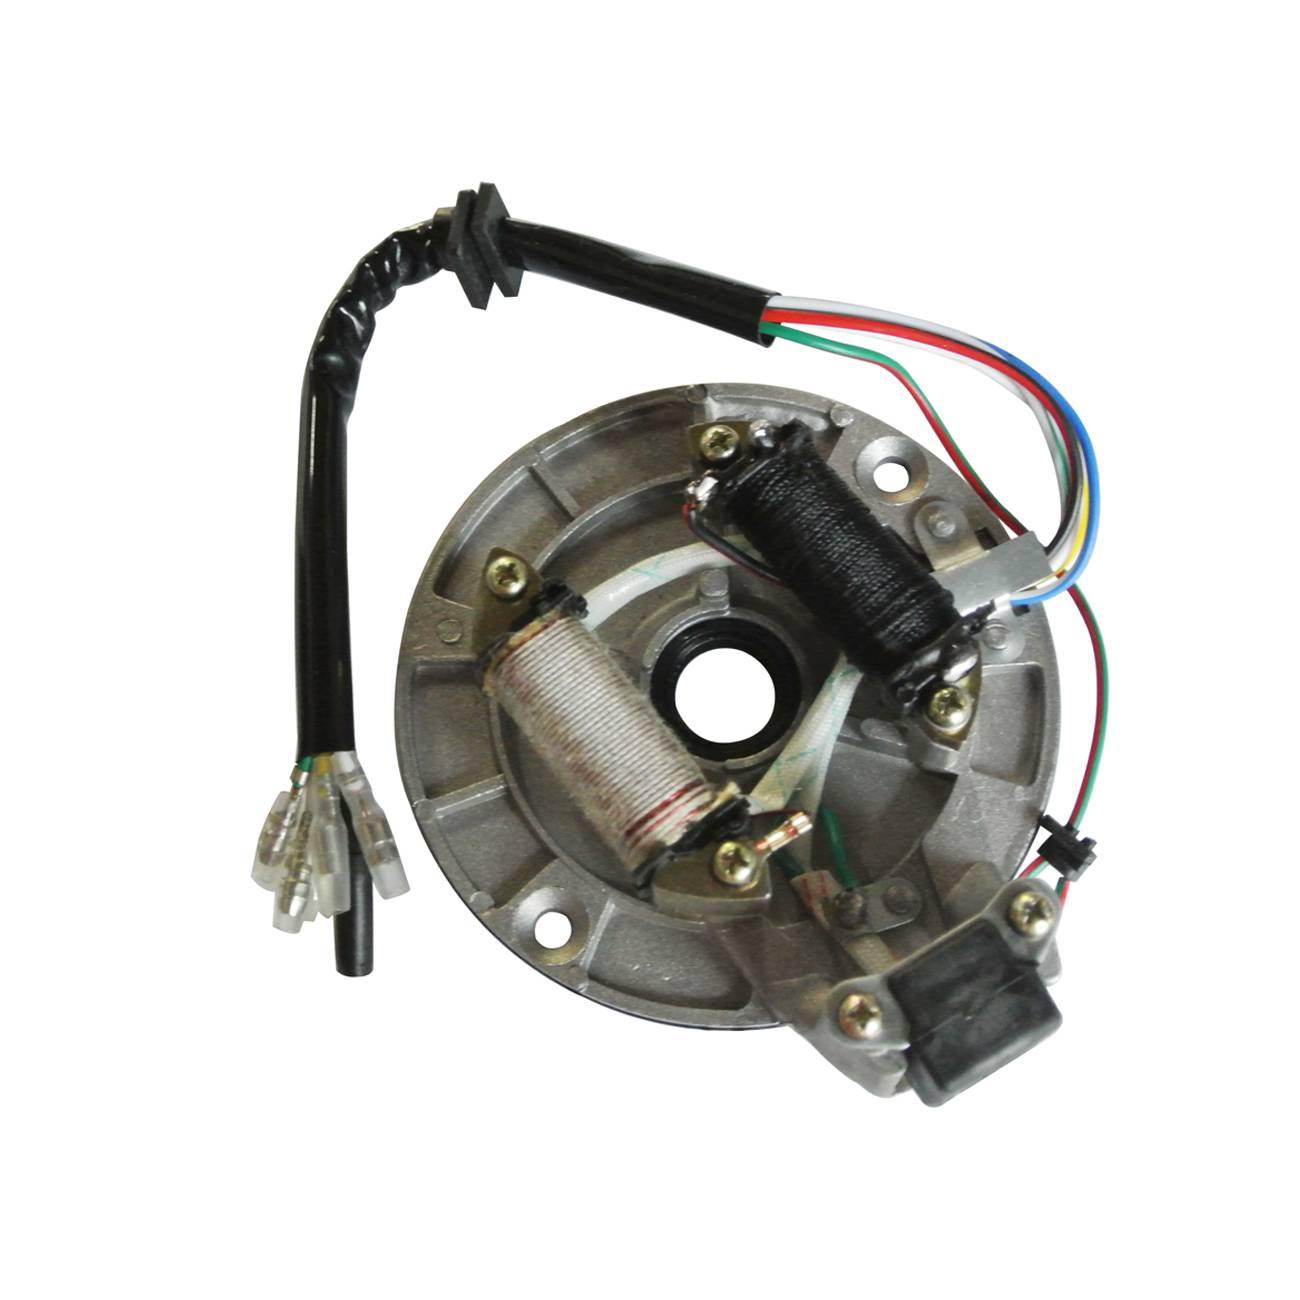 1 Juego de bobina magnética para motor de moto de cross 110cc 125cc